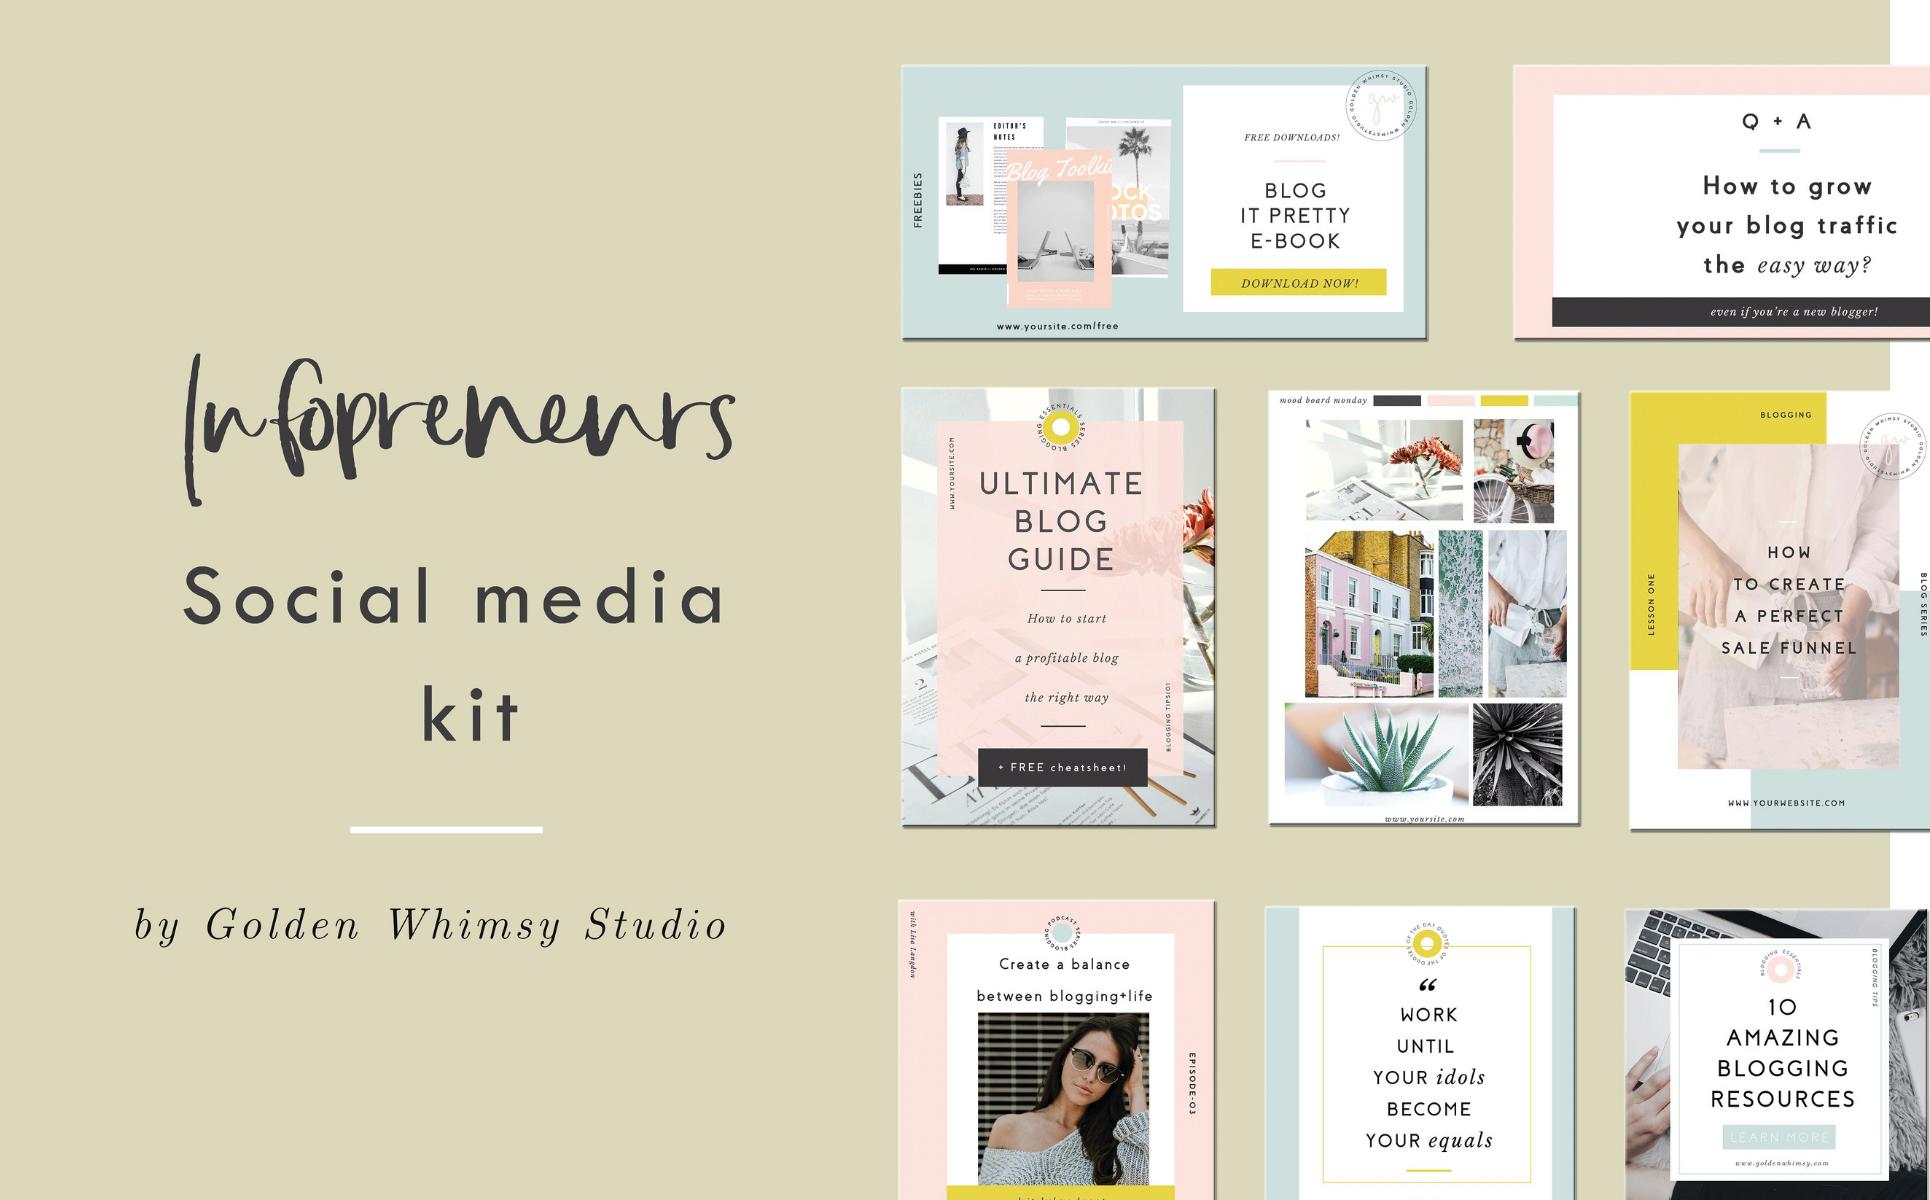 CANVA Infopreneur Kit Social Media